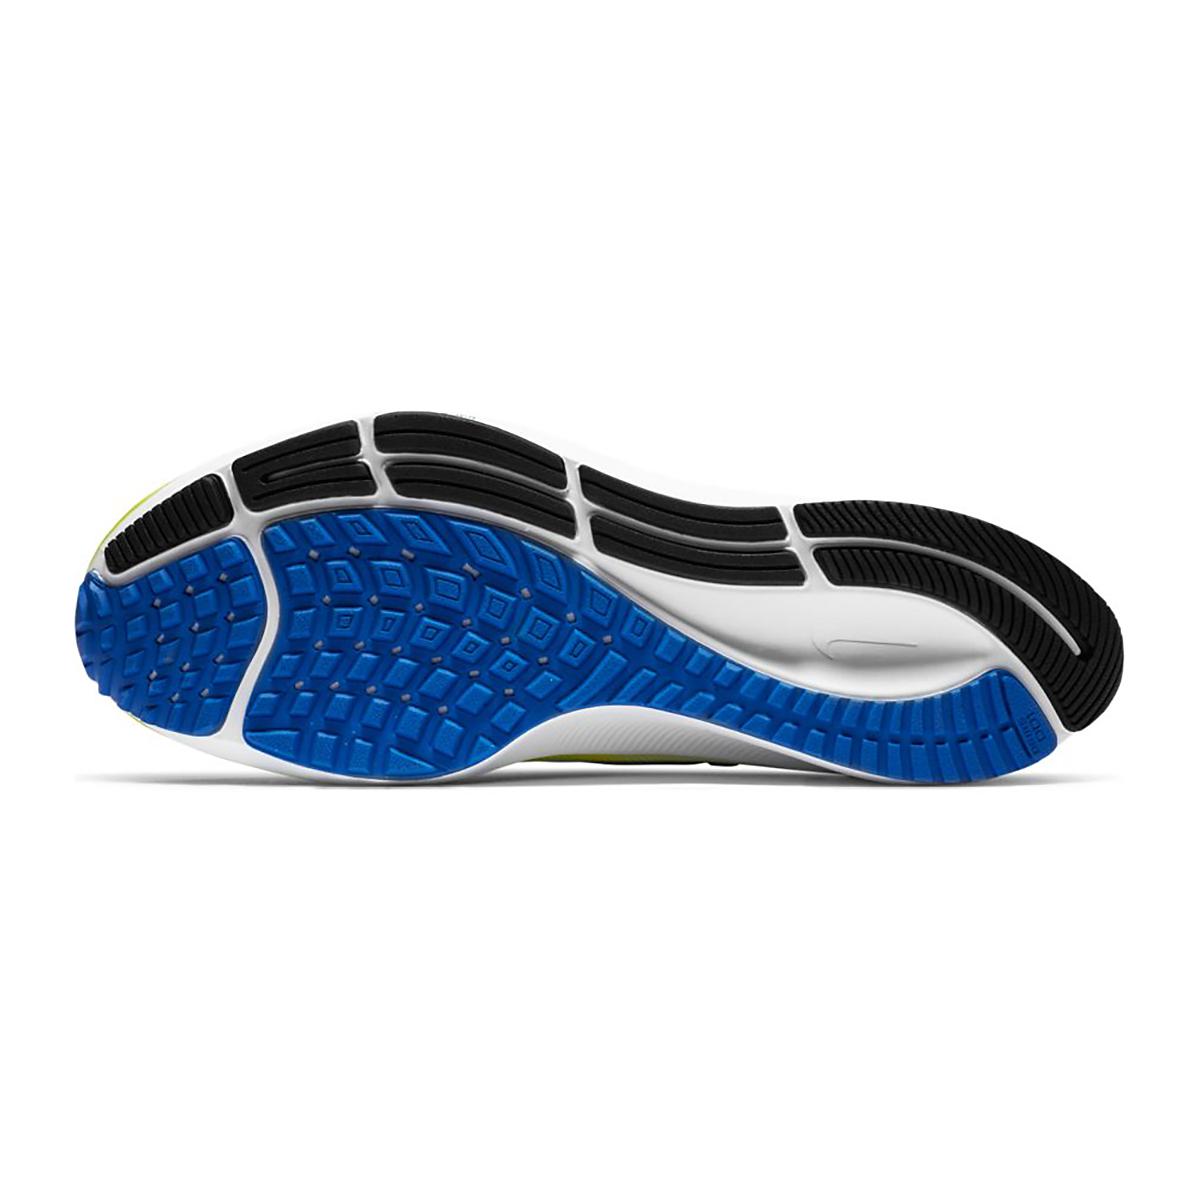 Men's Nike Nike Air Zoom Pegasus 37 Running Shoe - Color: White/Racer Blue/Cyber/Black - Size: 6 - Width: Regular, White/Racer Blue/Cyber/Black, large, image 3